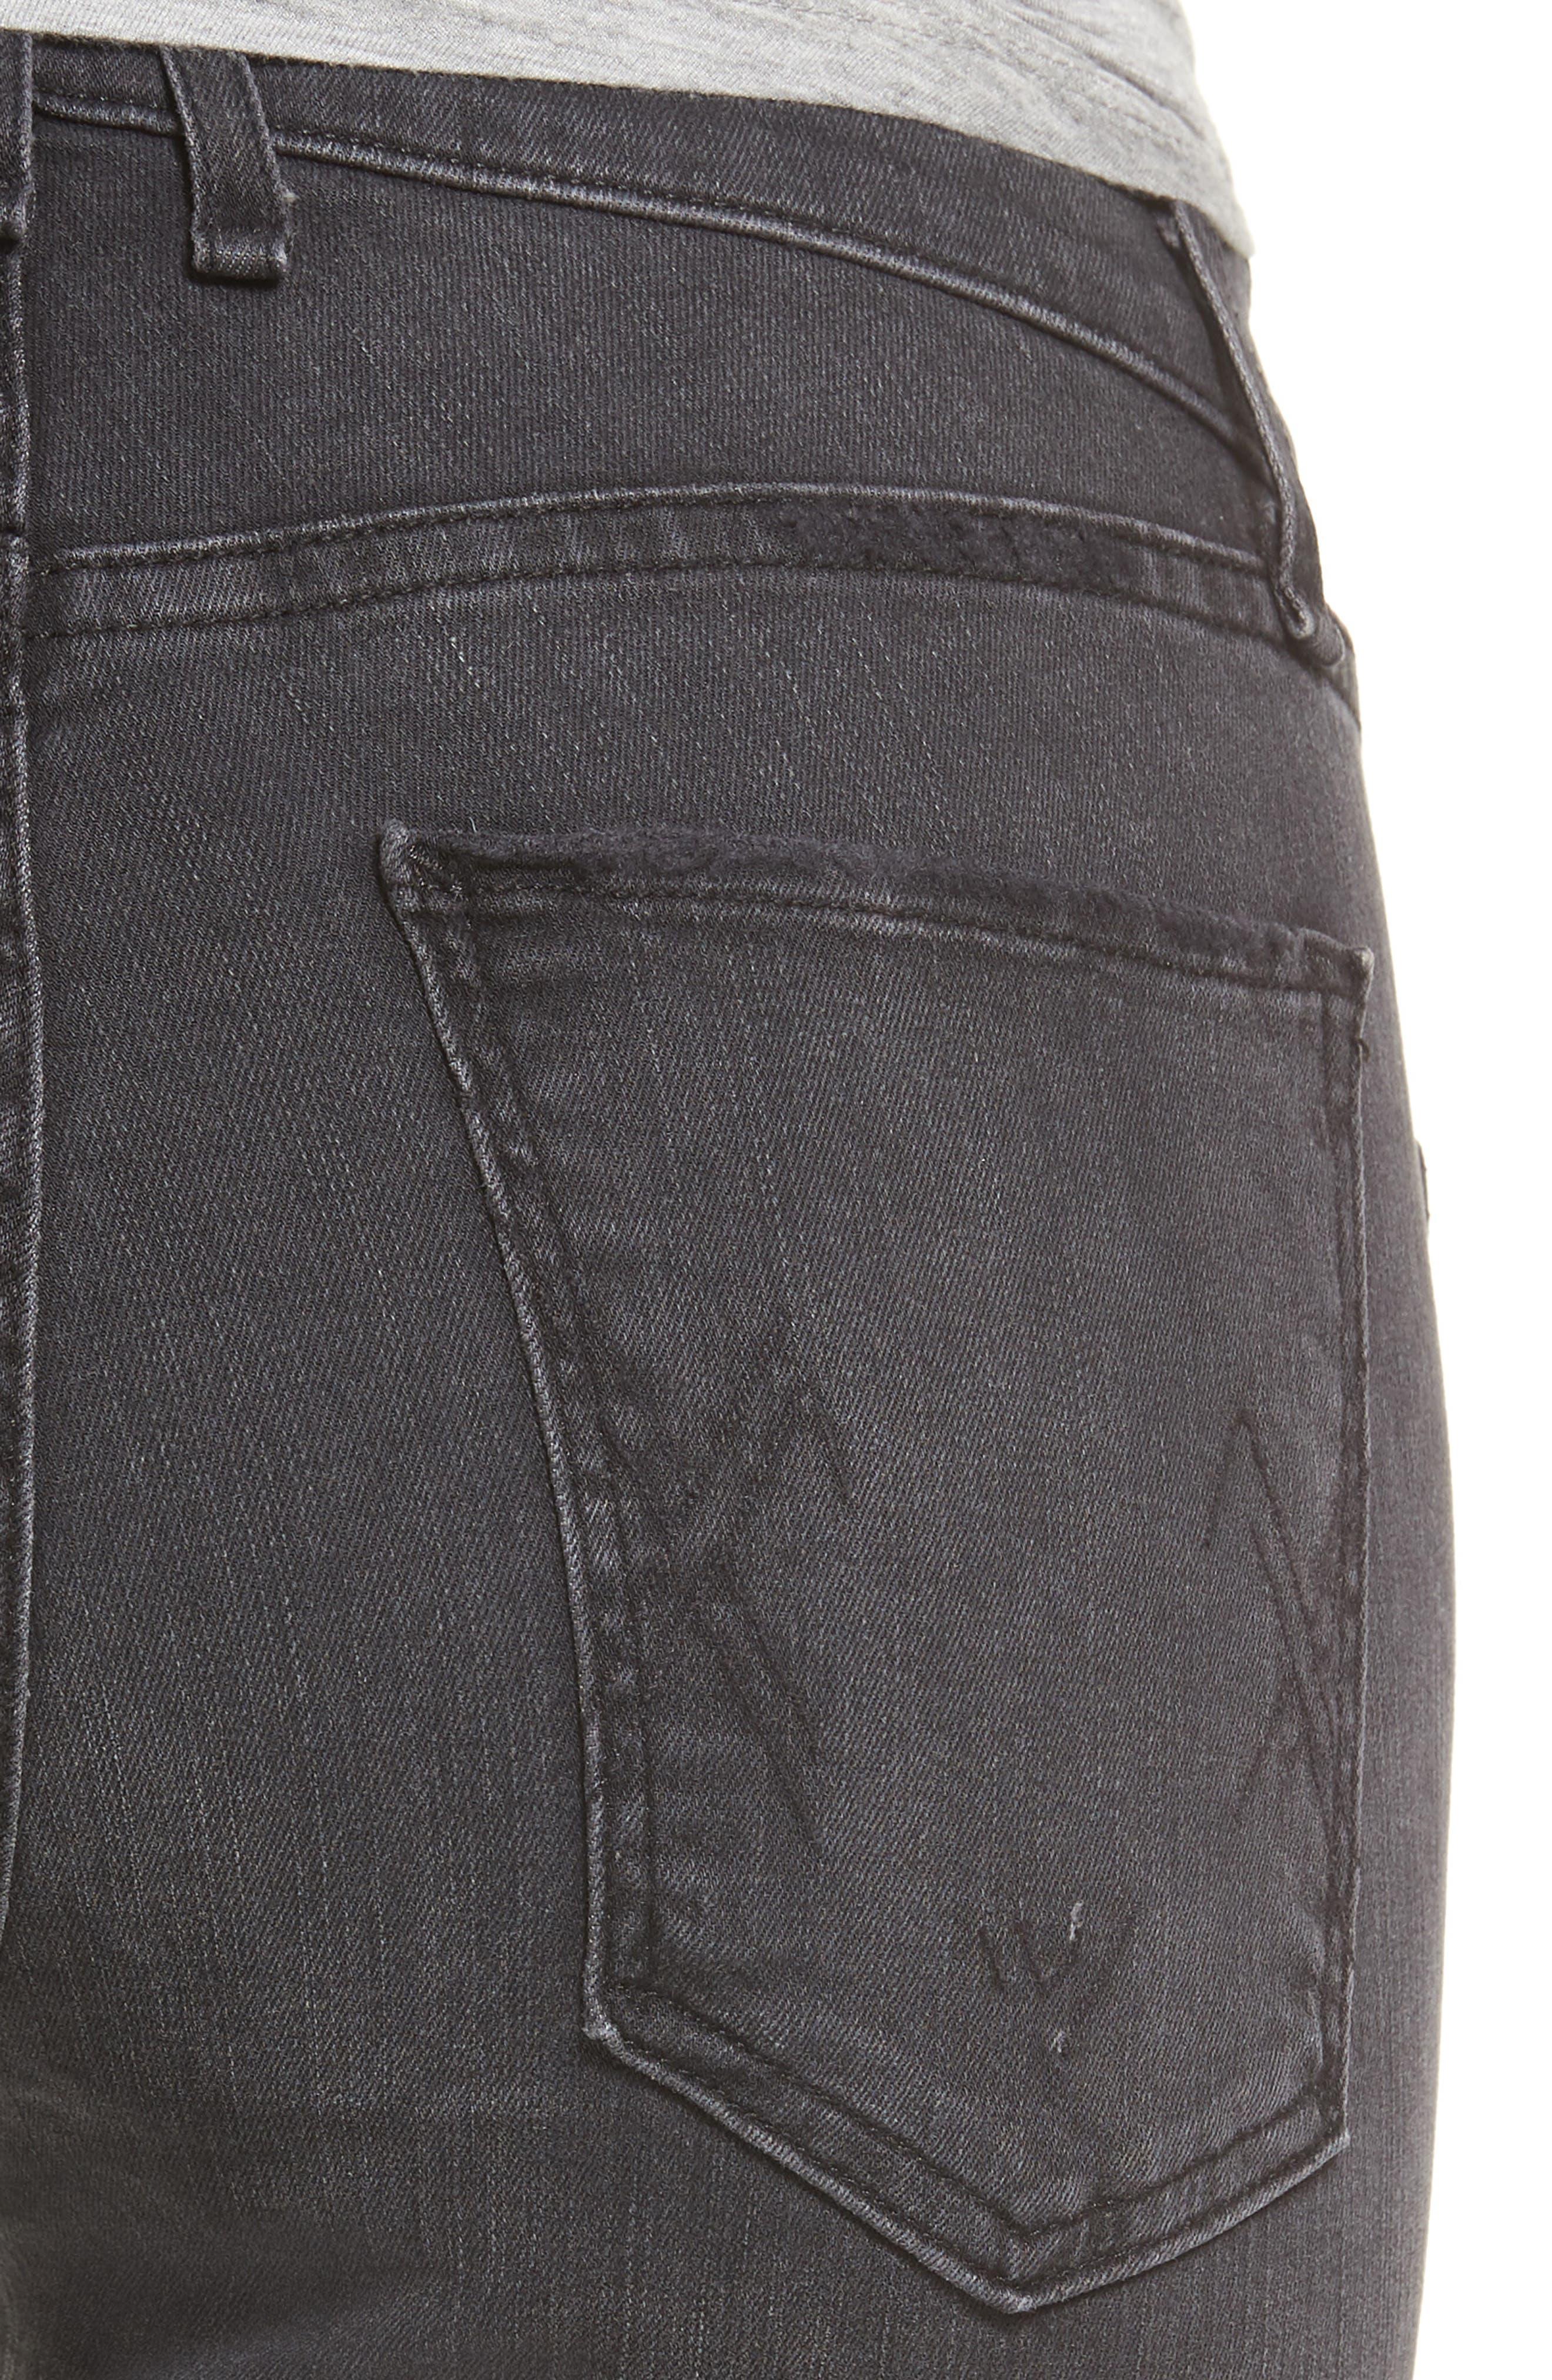 Newton Skinny Jeans,                             Alternate thumbnail 4, color,                             011